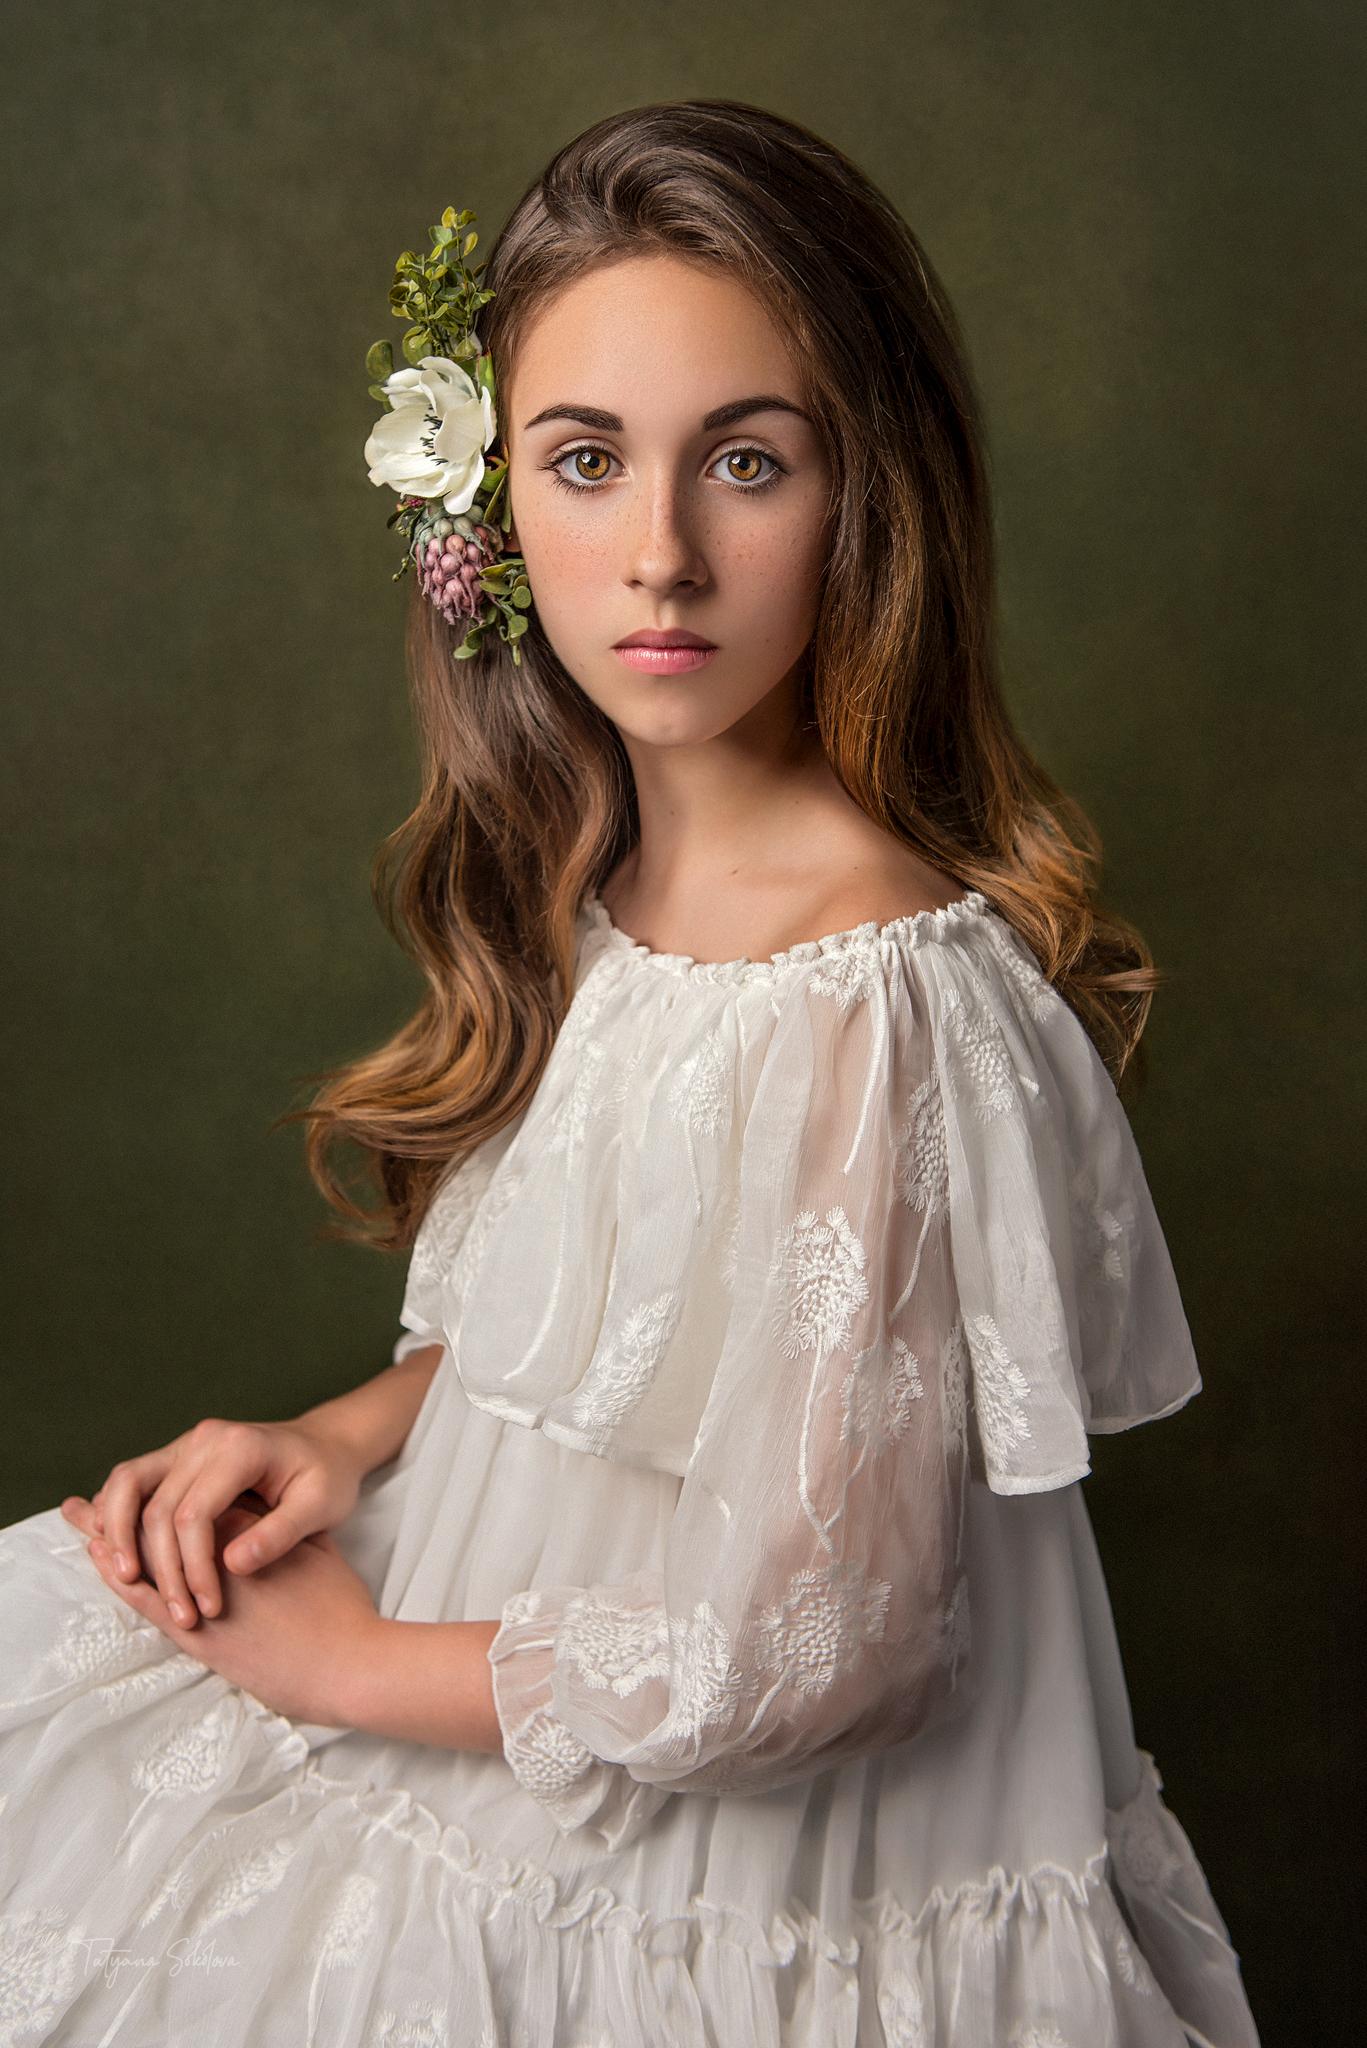 Houston Family and Child Photography; Houston Child Portrait Photograper; Fine Art Photography in Houston; Houston Modeling Headshots; Houston Modeling Portfolio Phot Sessions